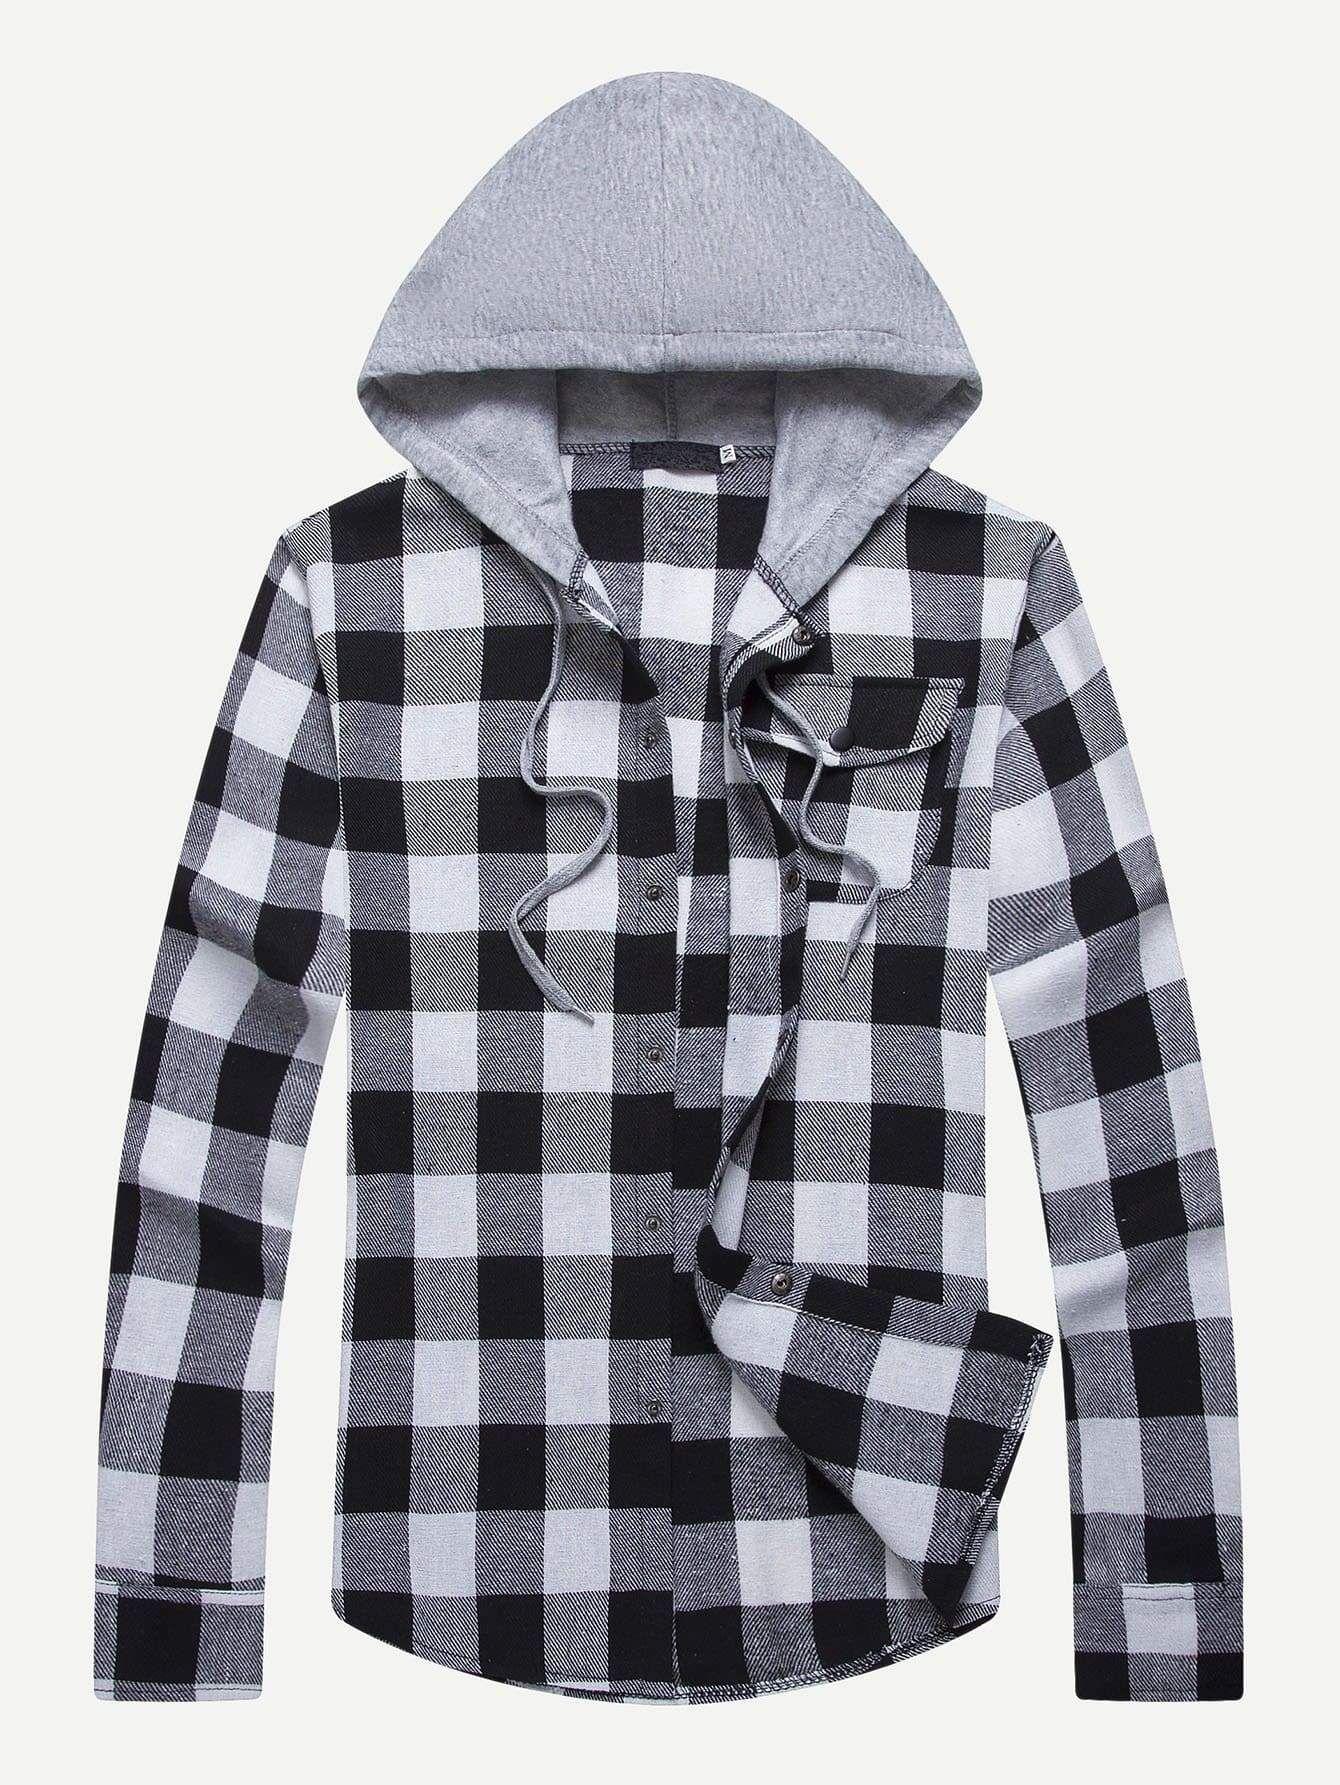 Men S Black White Checked Hooded Shirt Multi Sizes Free Ship Plaid Shirt Men Mens Shirts Hooded Shirt [ 1785 x 1340 Pixel ]